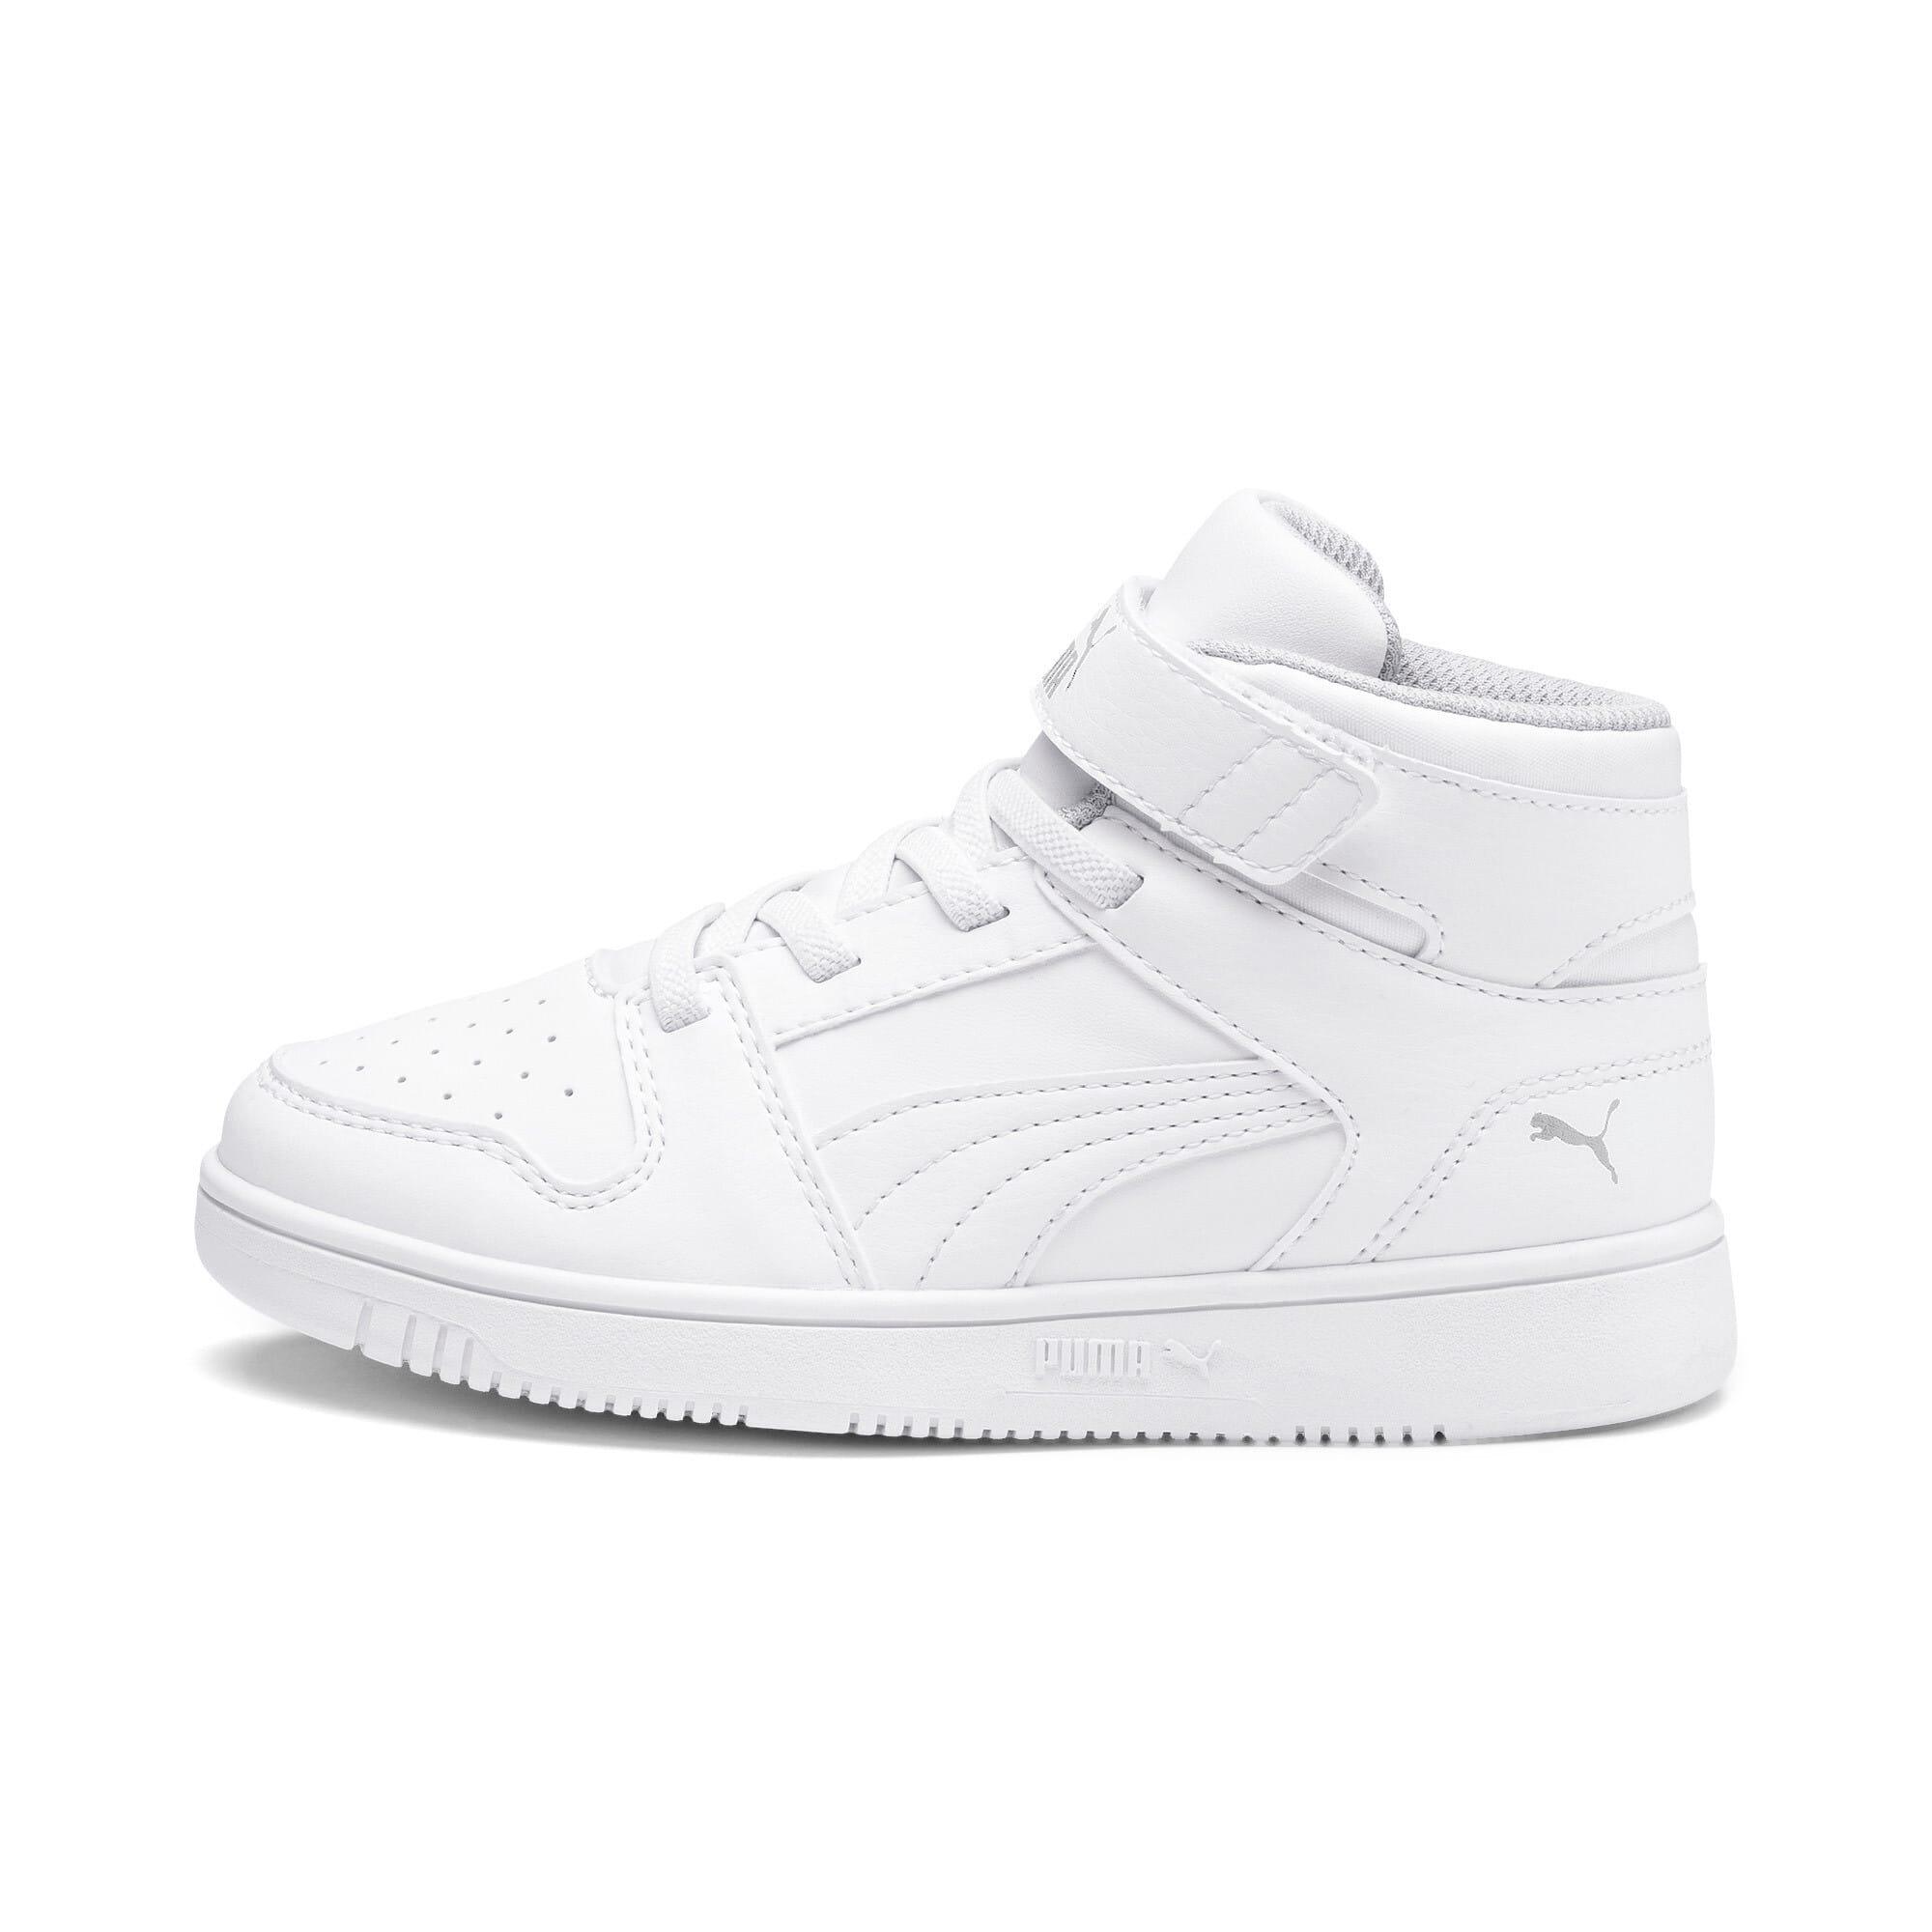 Thumbnail 1 of Rebound Lay-Up SL V Kids Sneaker, Puma White-Gray Violet, medium